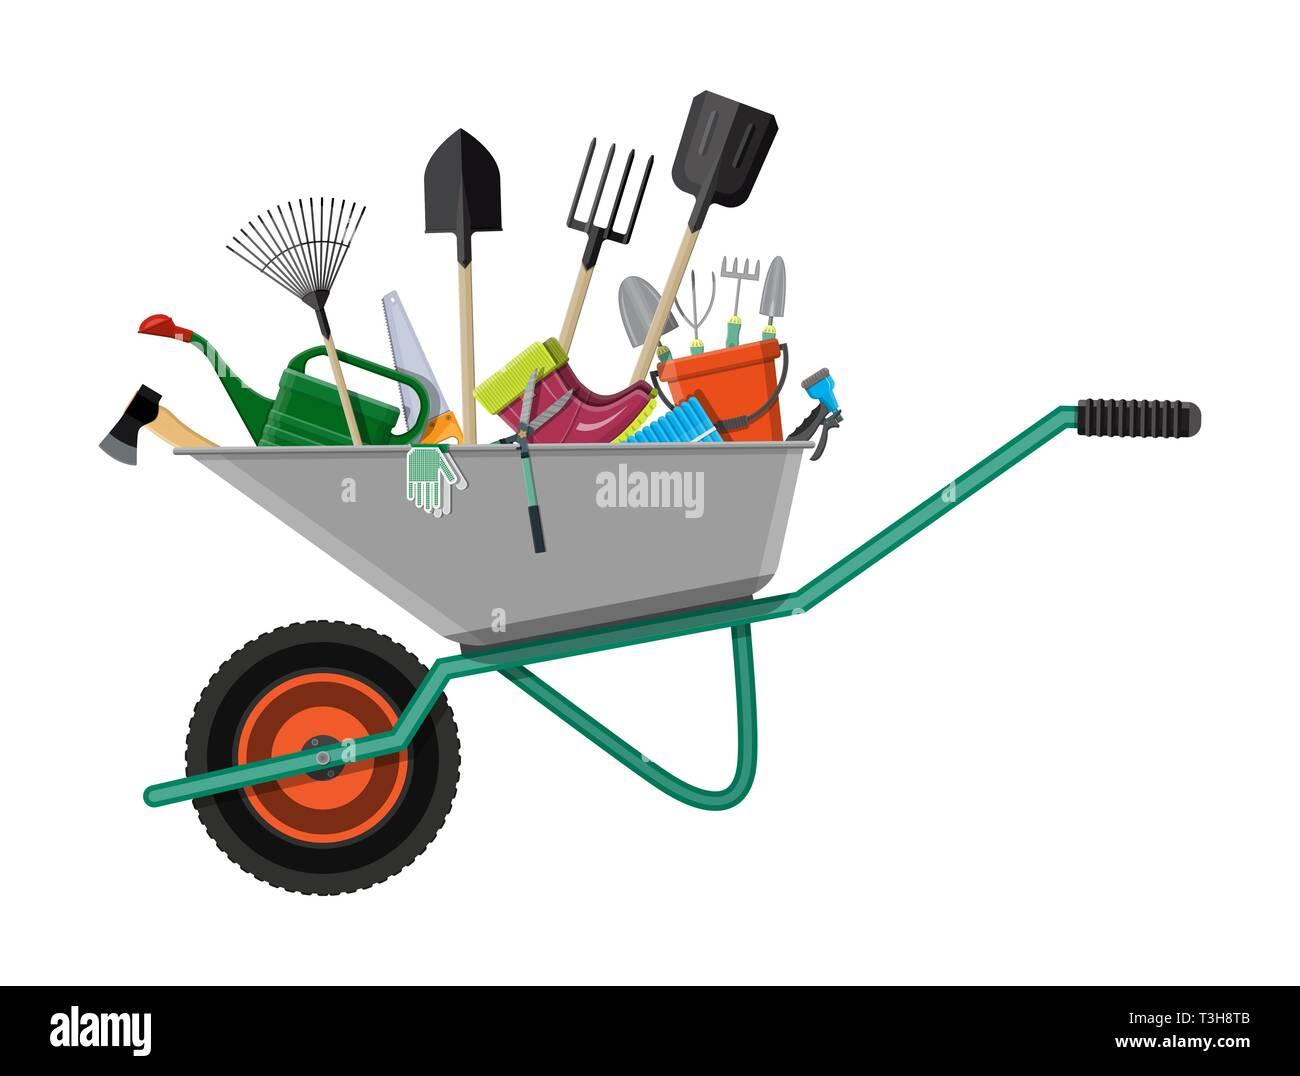 . Gardening tools set in wheelbarrow  Equipment for garden  Saw bucket